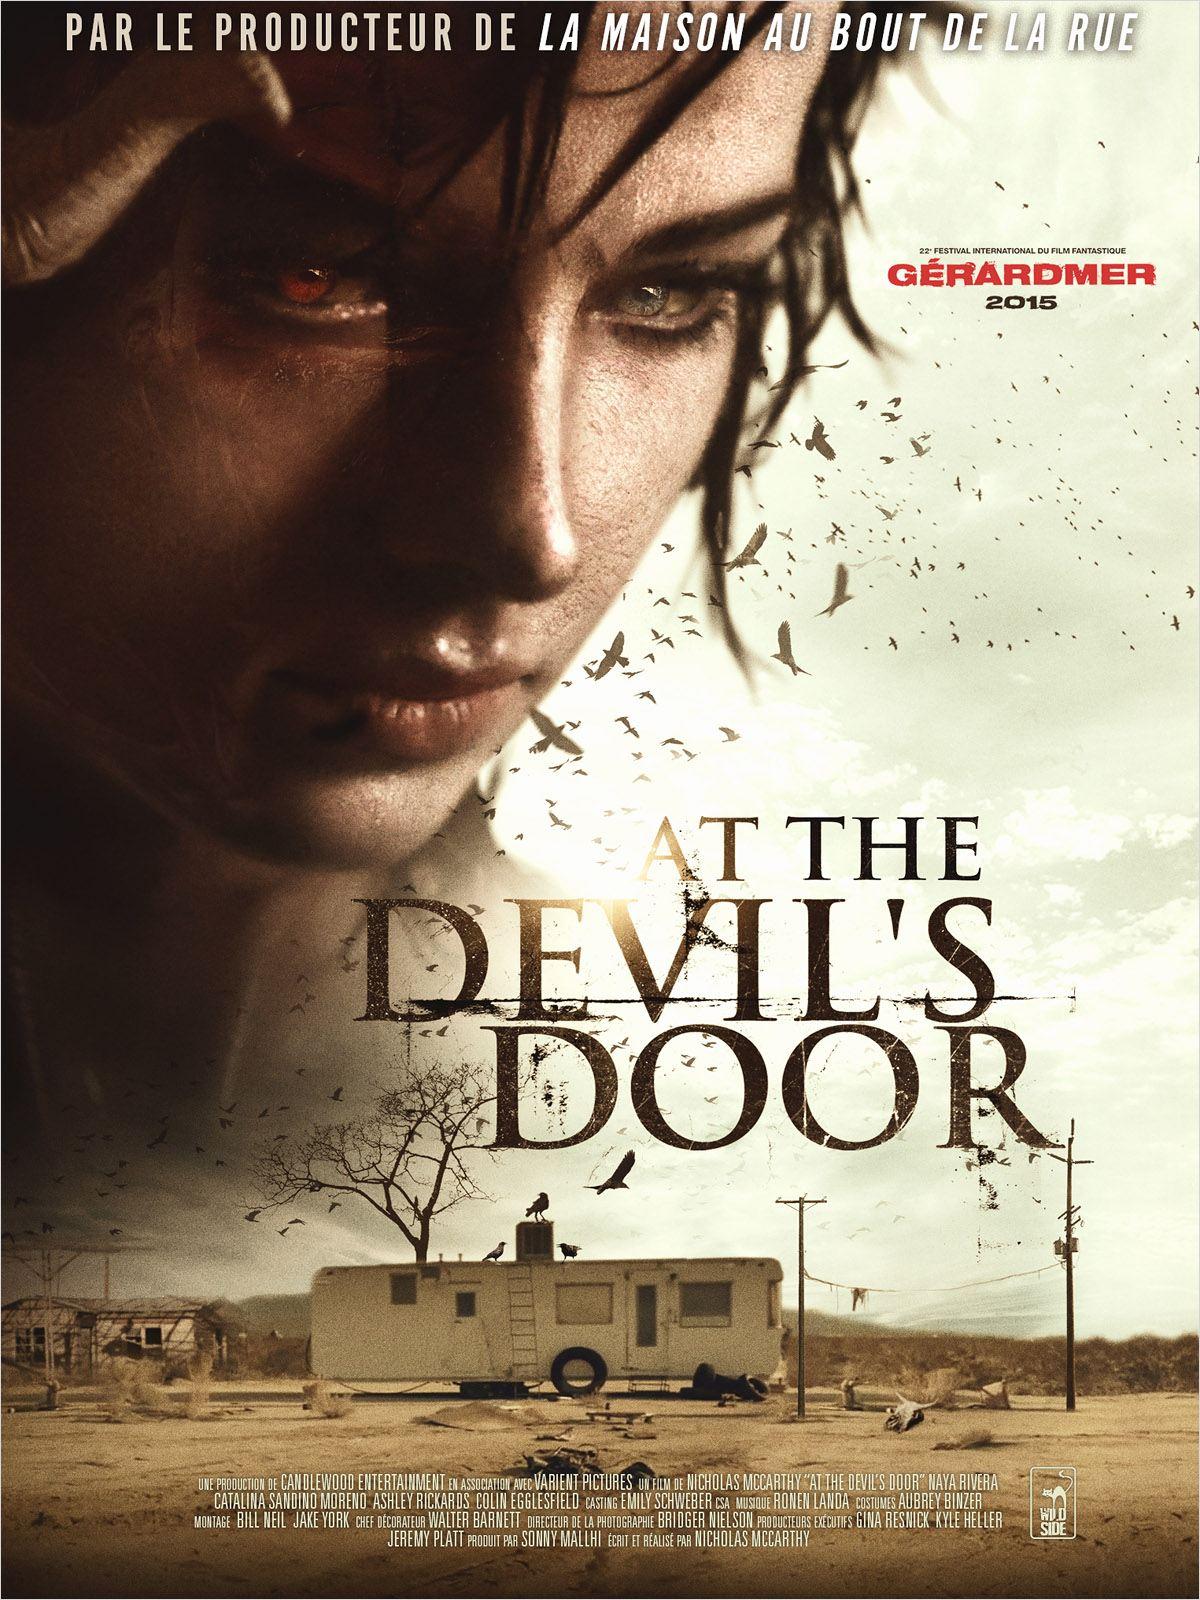 At the Devils Door (2014) [VOSTFR |  720p BluRay( DTS) ]